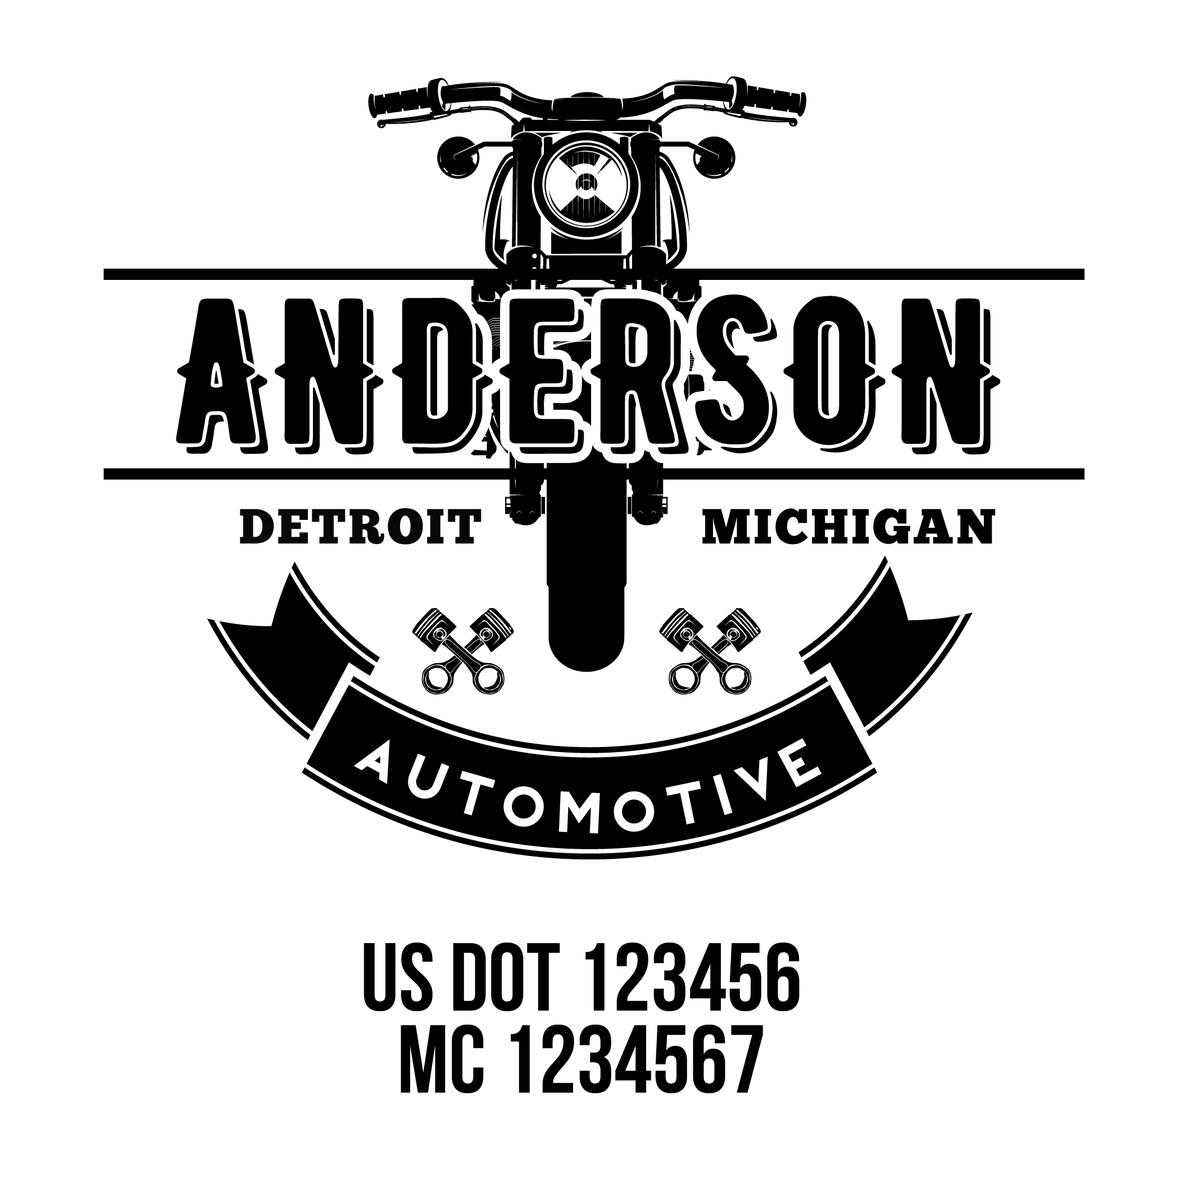 Mechanic, Auto Repair, Auto Body Shop Company Decal, 2